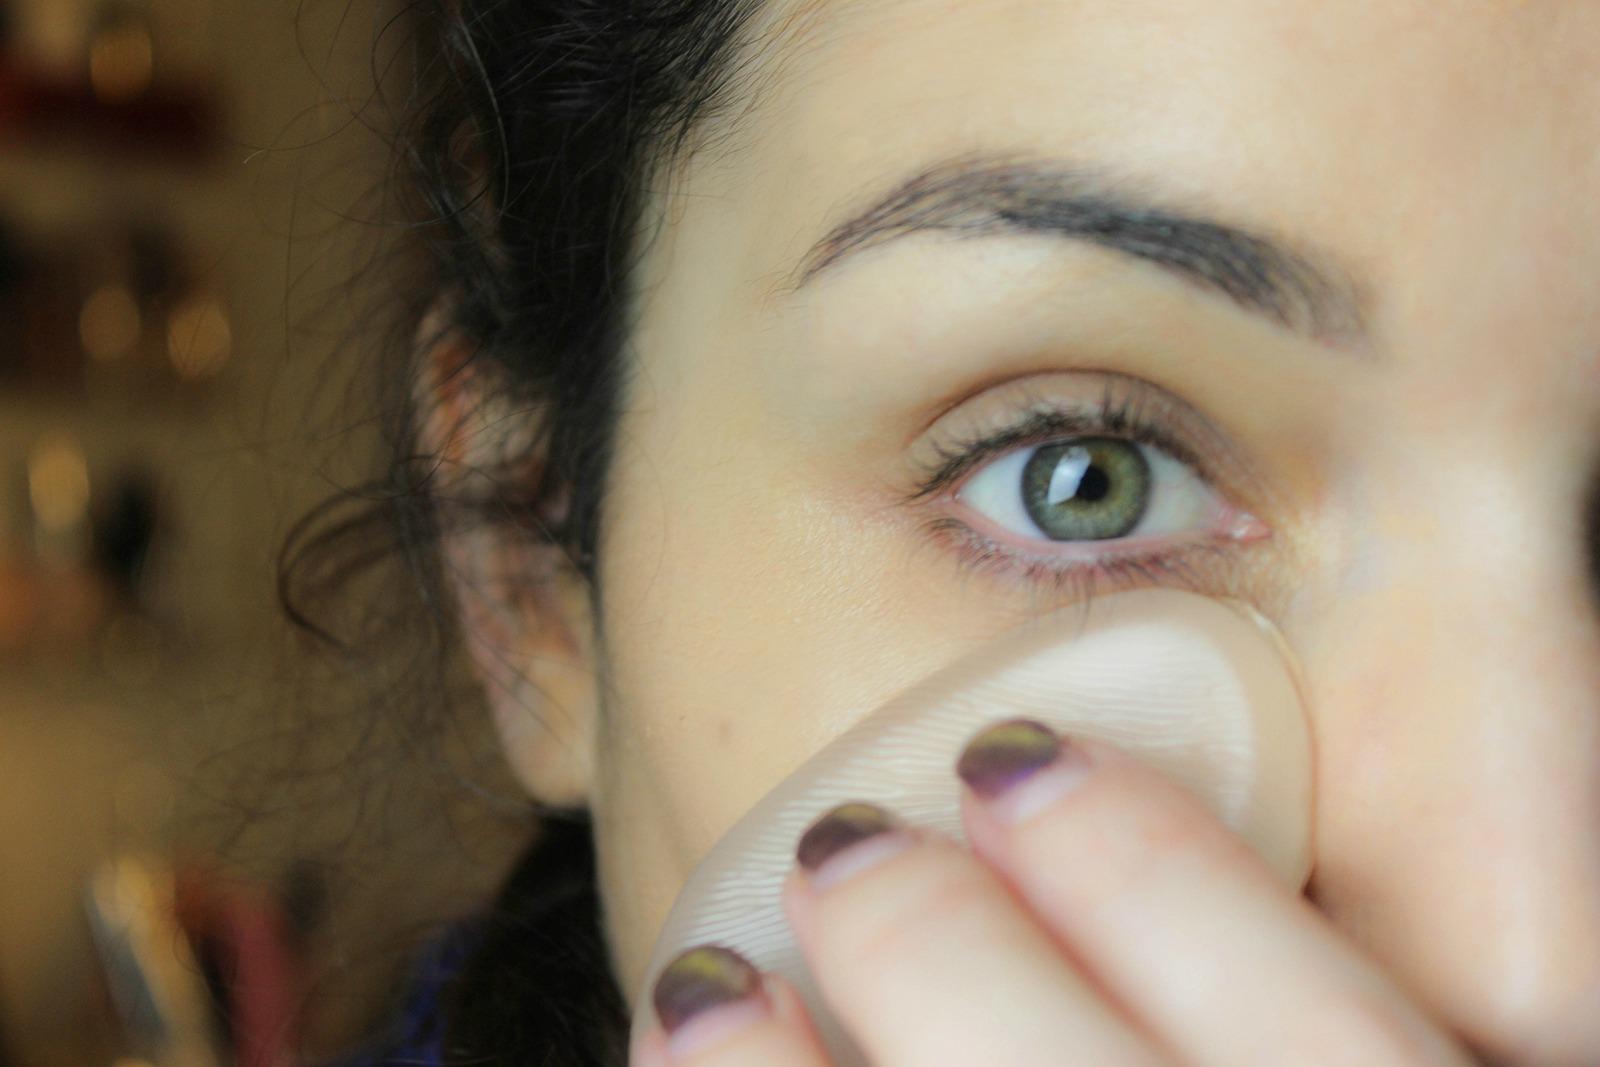 Eponge-silicone-silidrop-maquillage-3